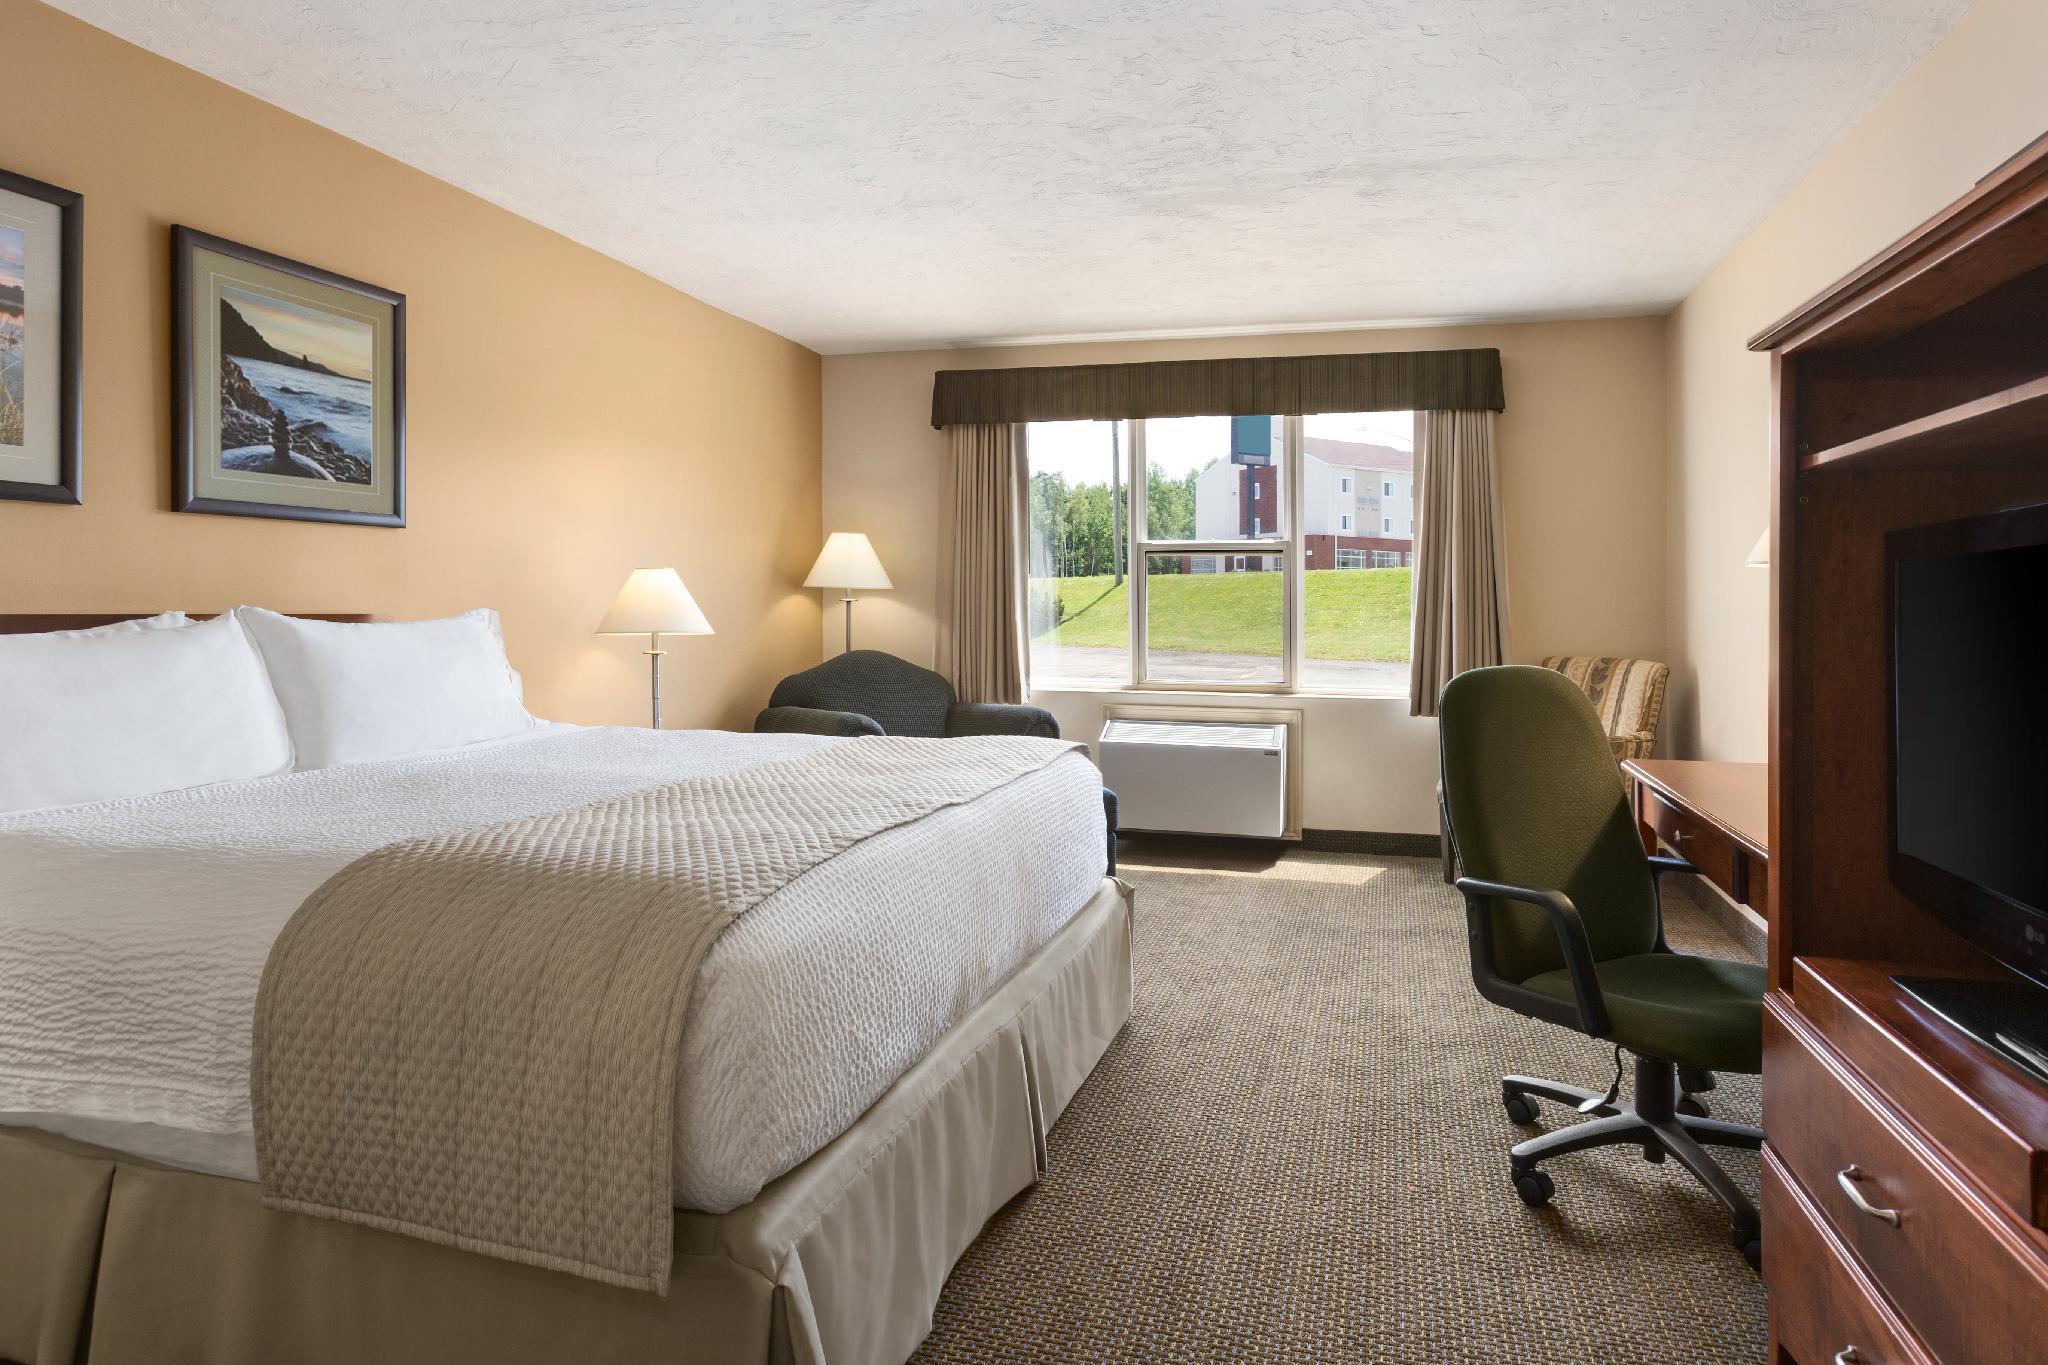 Days Inn & Suites by Wyndham Moncton, Westmorland